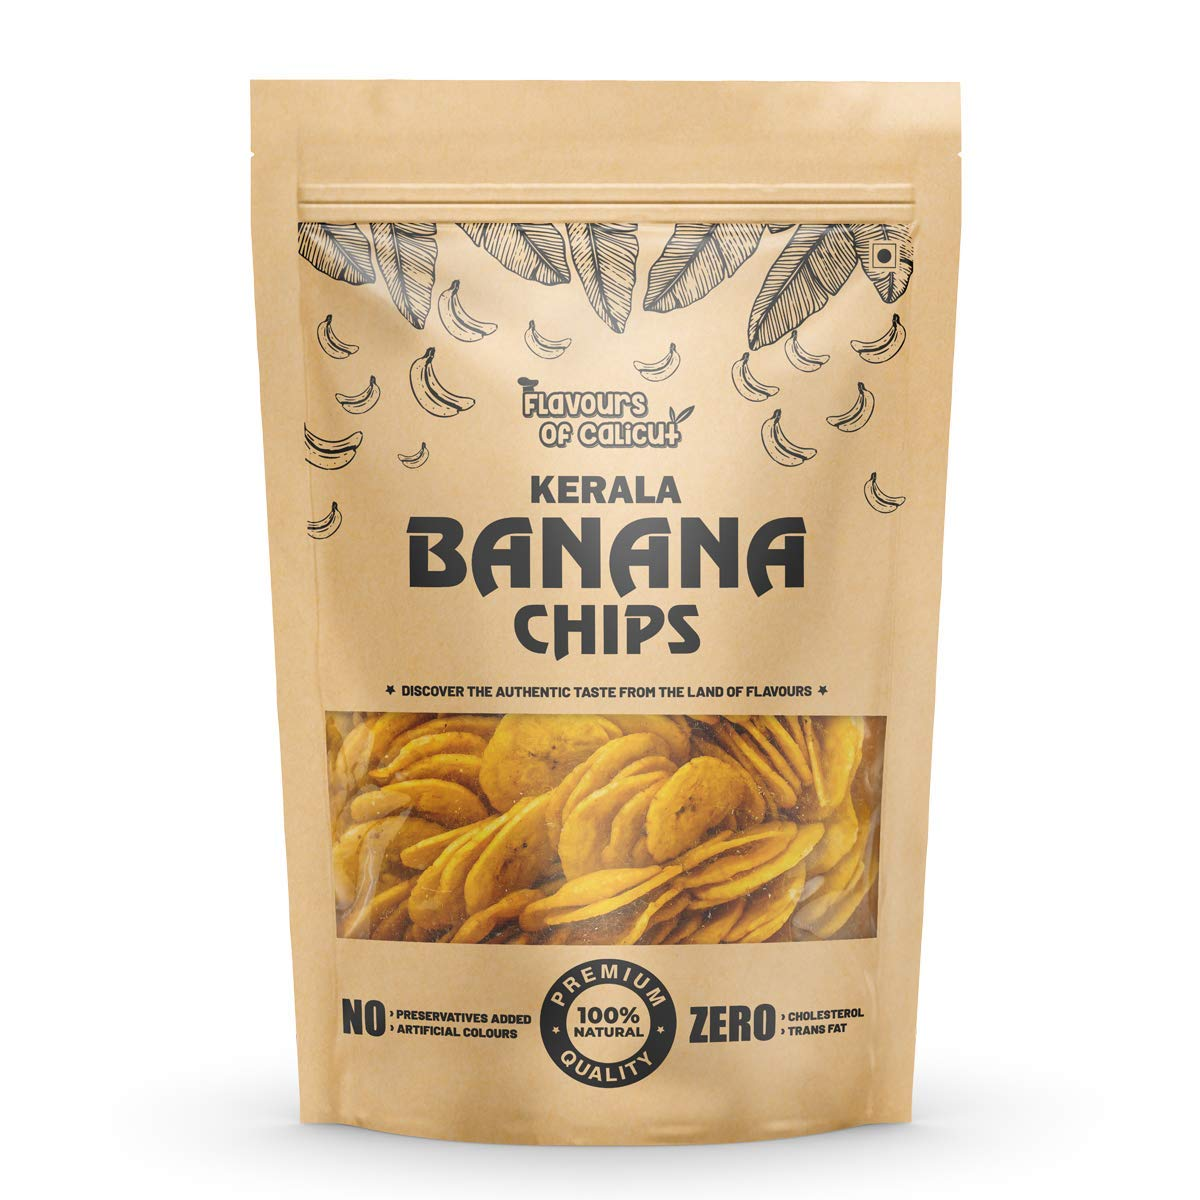 Flavours of Calicut Kerala Banana Chips - 400g